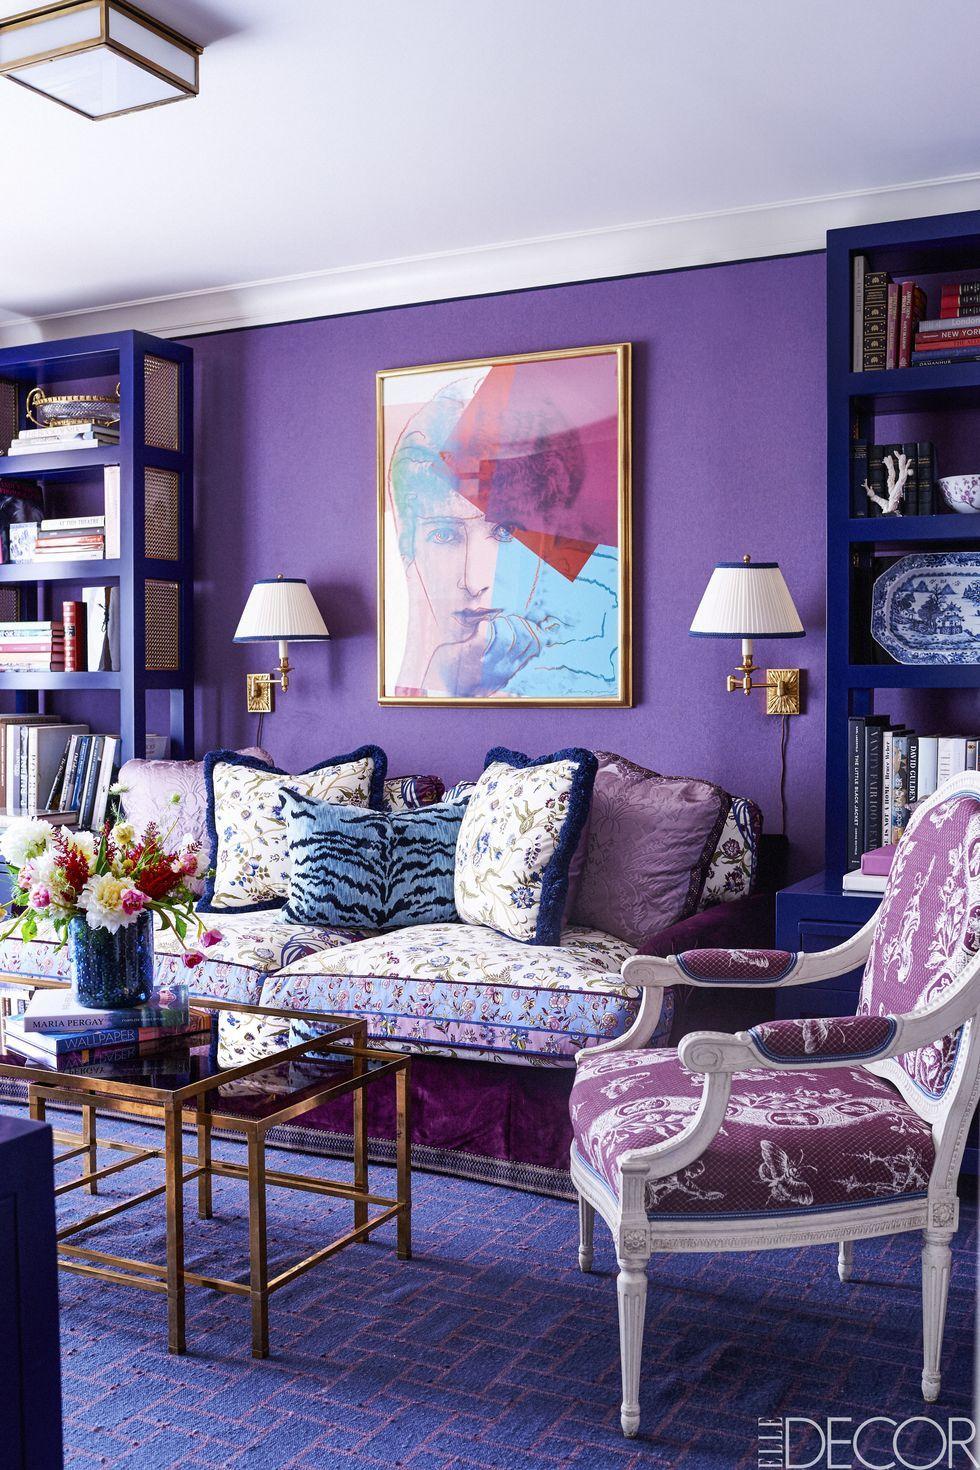 25 Rooms That Will Convince You Of The Power Of Purple Kleurrijke Kamers Woonkamer Decoratie Designkamer